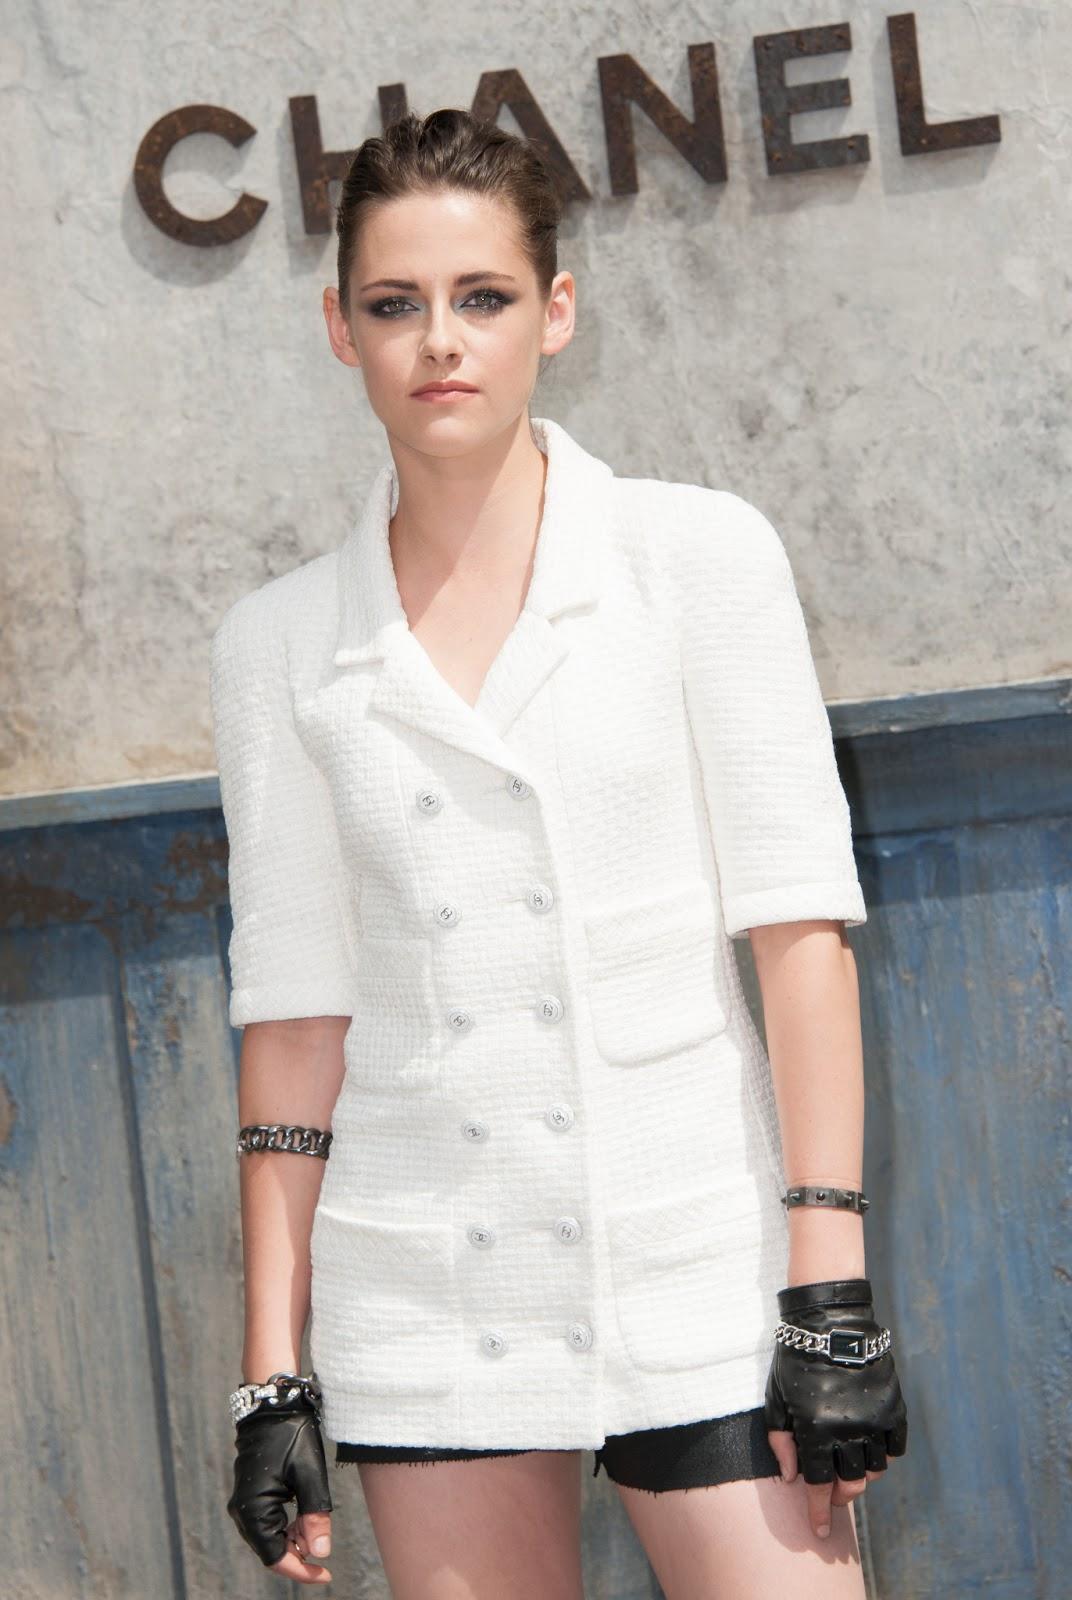 Apotamkin: The Cold One of Egypt: Kristen Stewart at ...